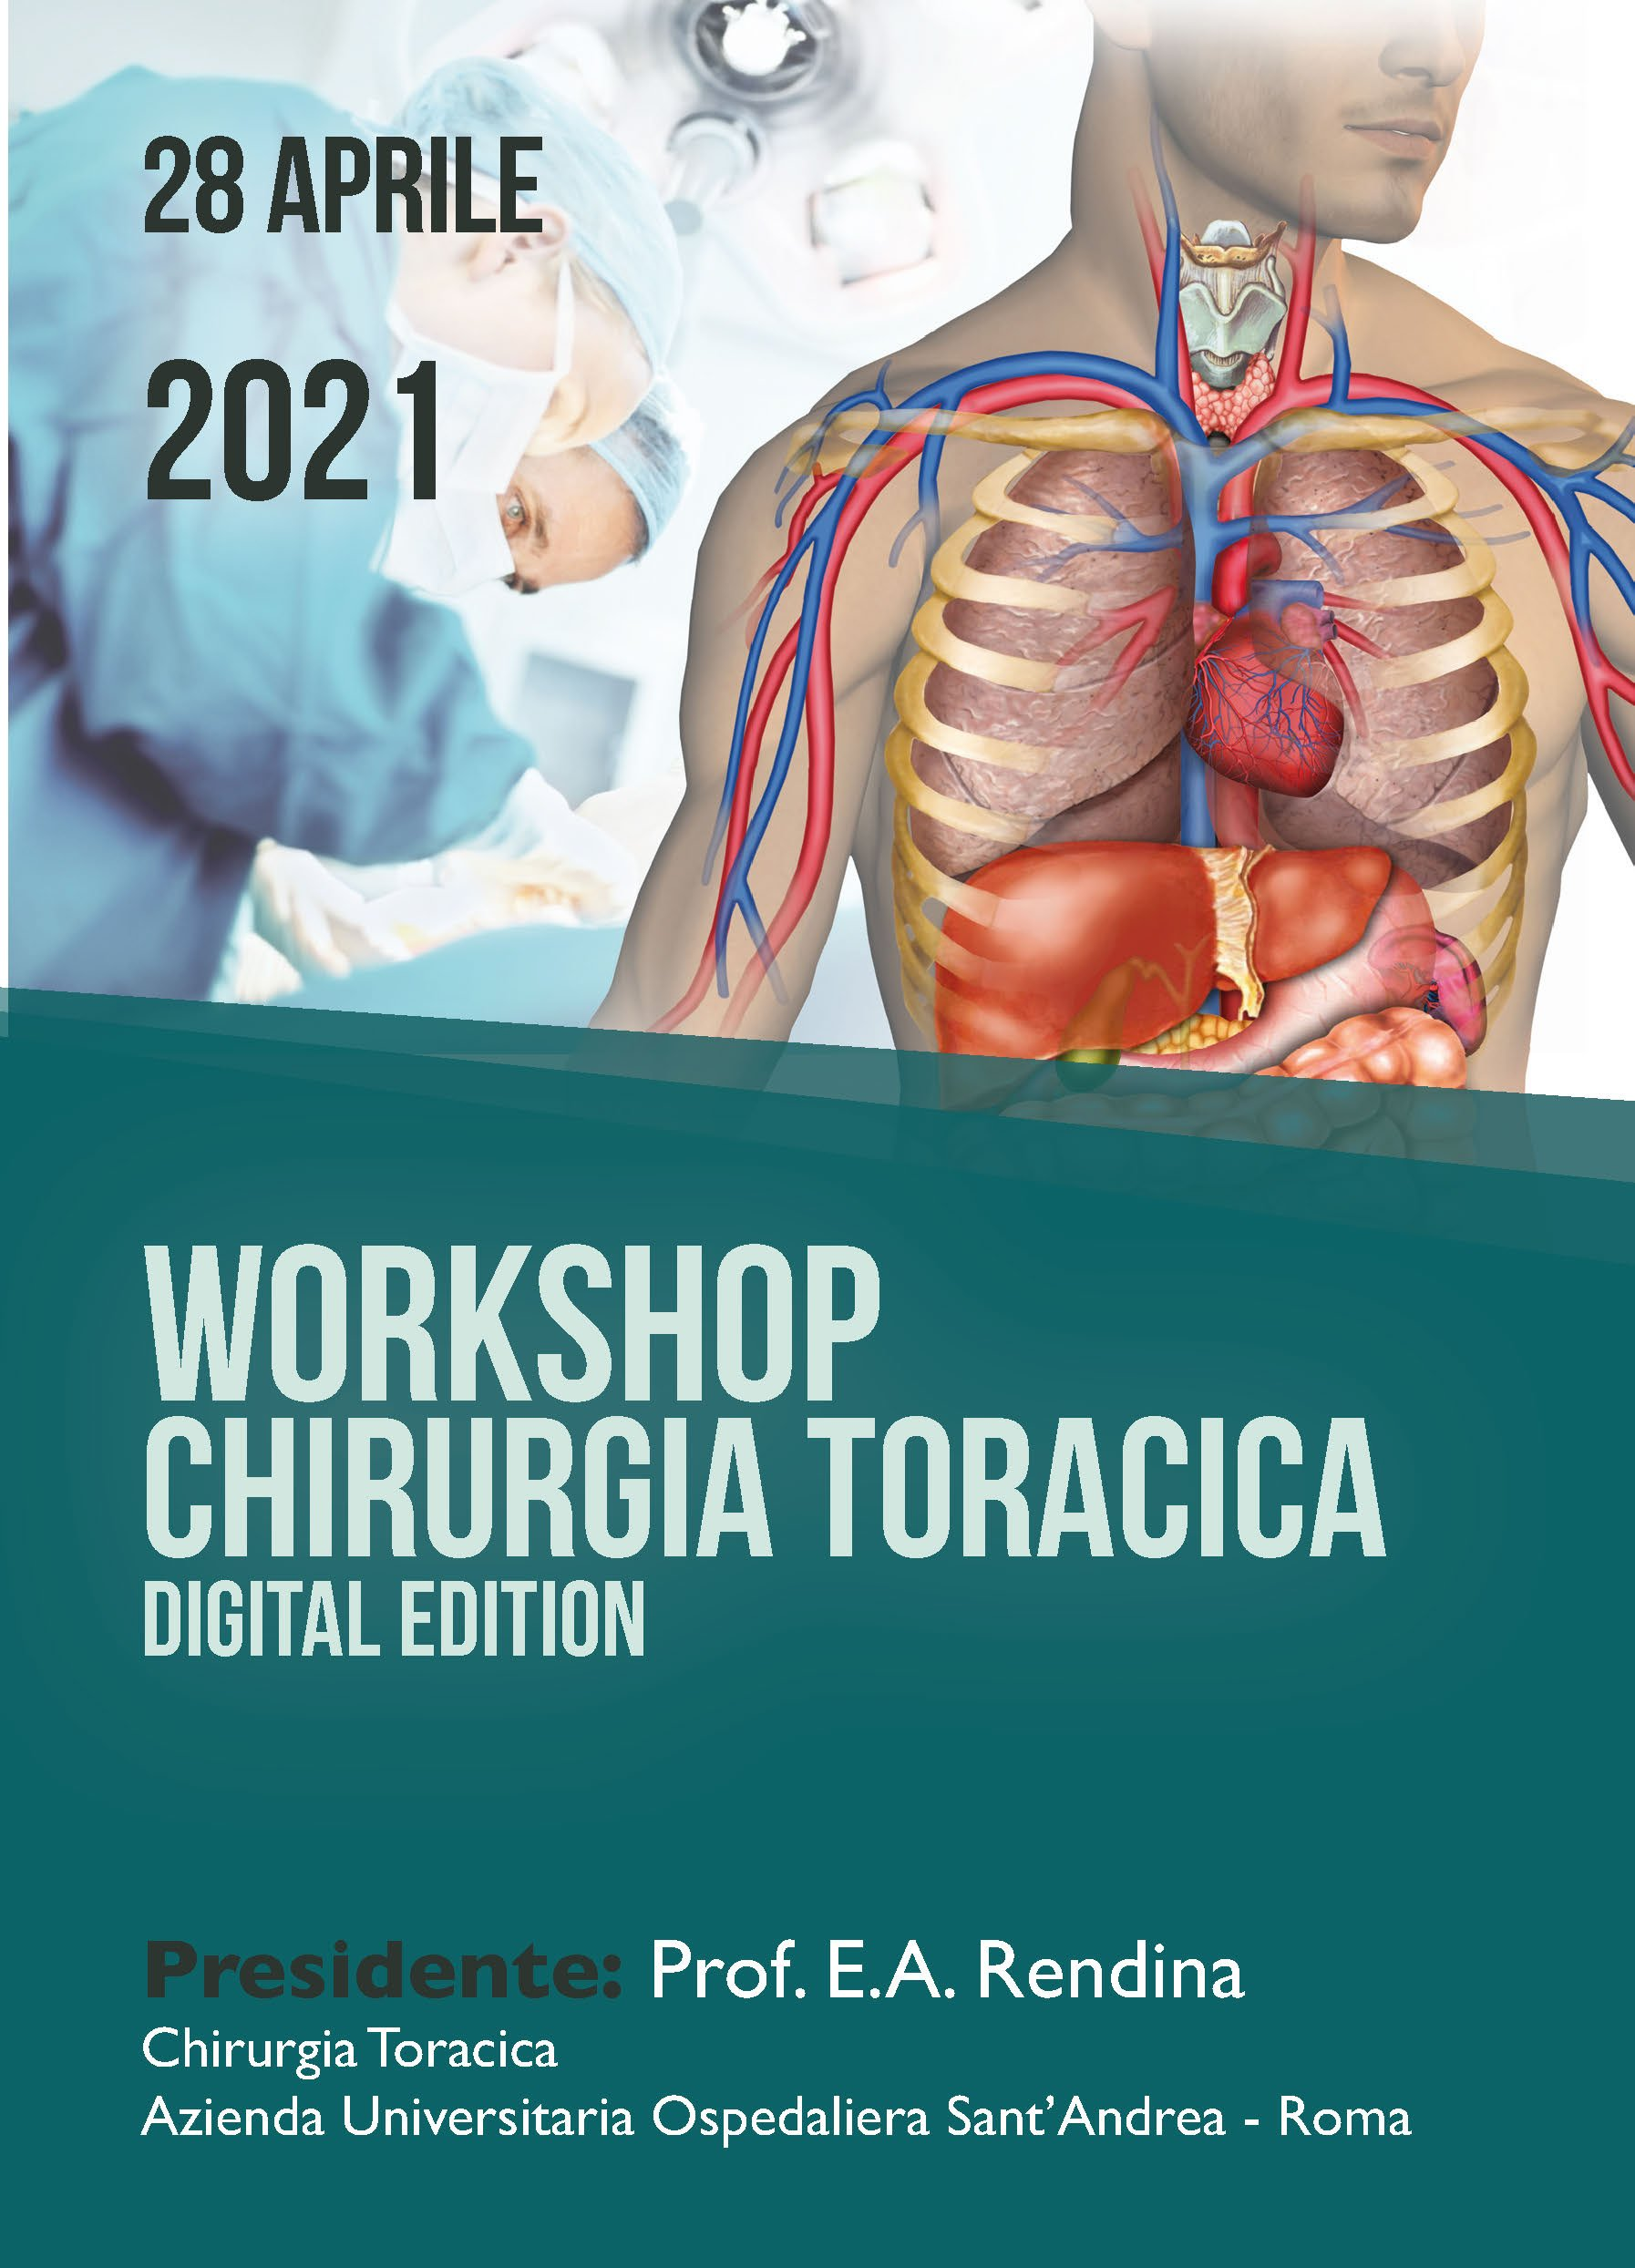 WORKSHOP CHIRURGIA TORACICA - DIGITAL EDITION